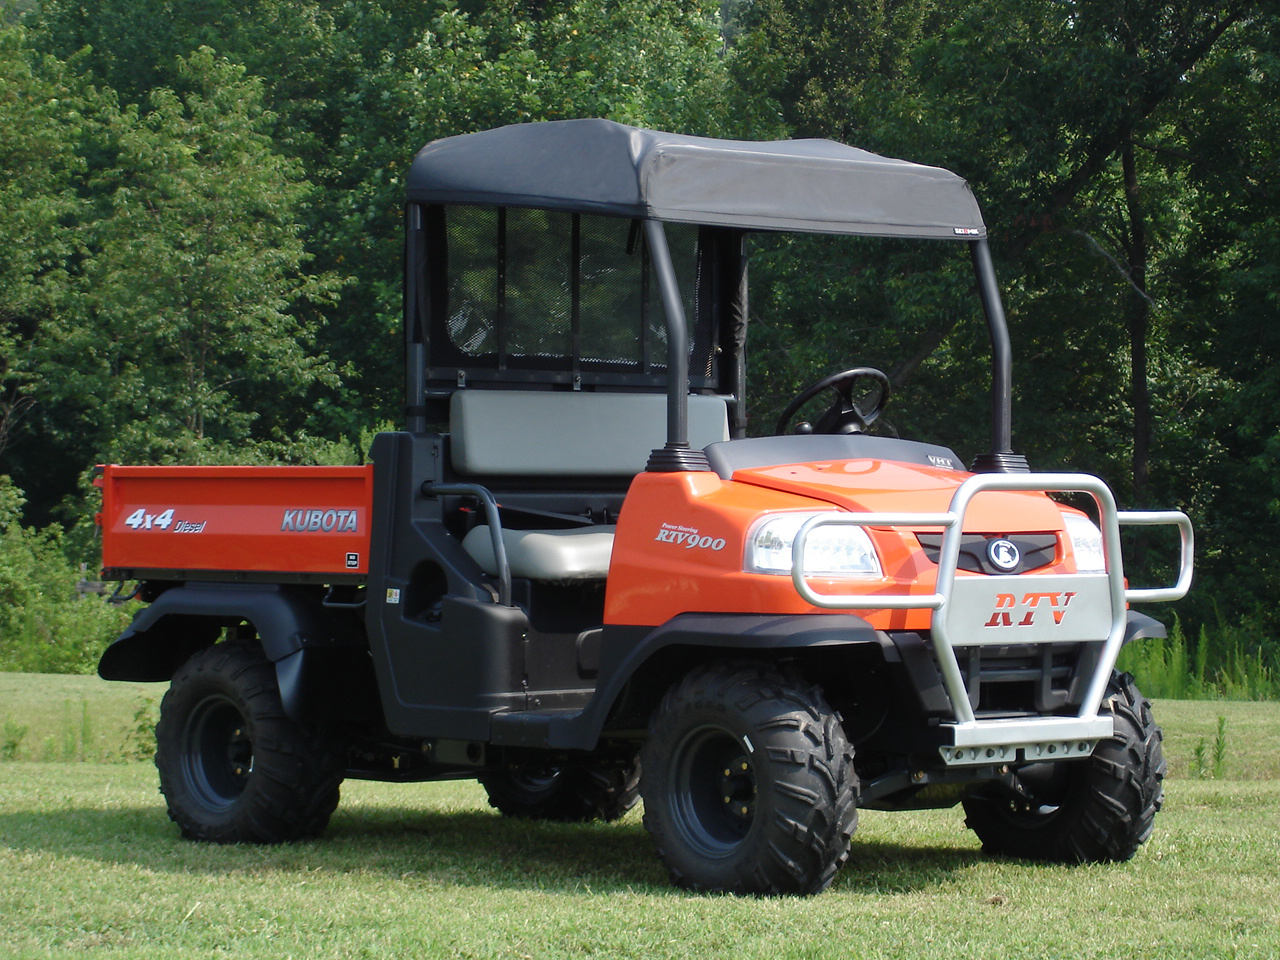 Used Utility Vehicles >> Used Utility Vehicles Archives Steen Enterprises